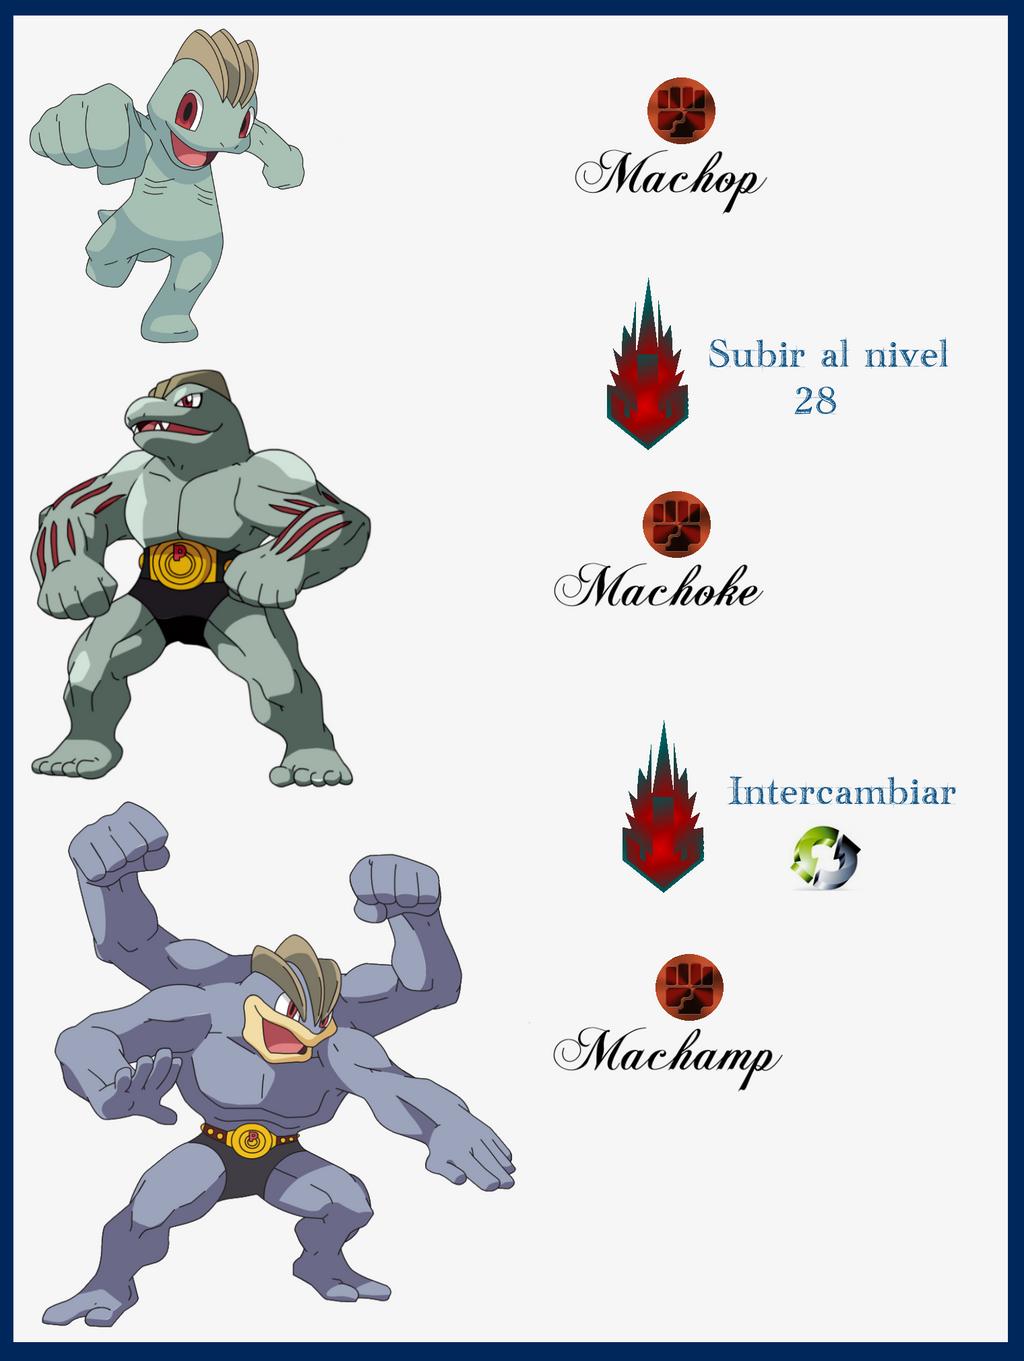 Pokemon Machop Evolution Images | Pokemon Images